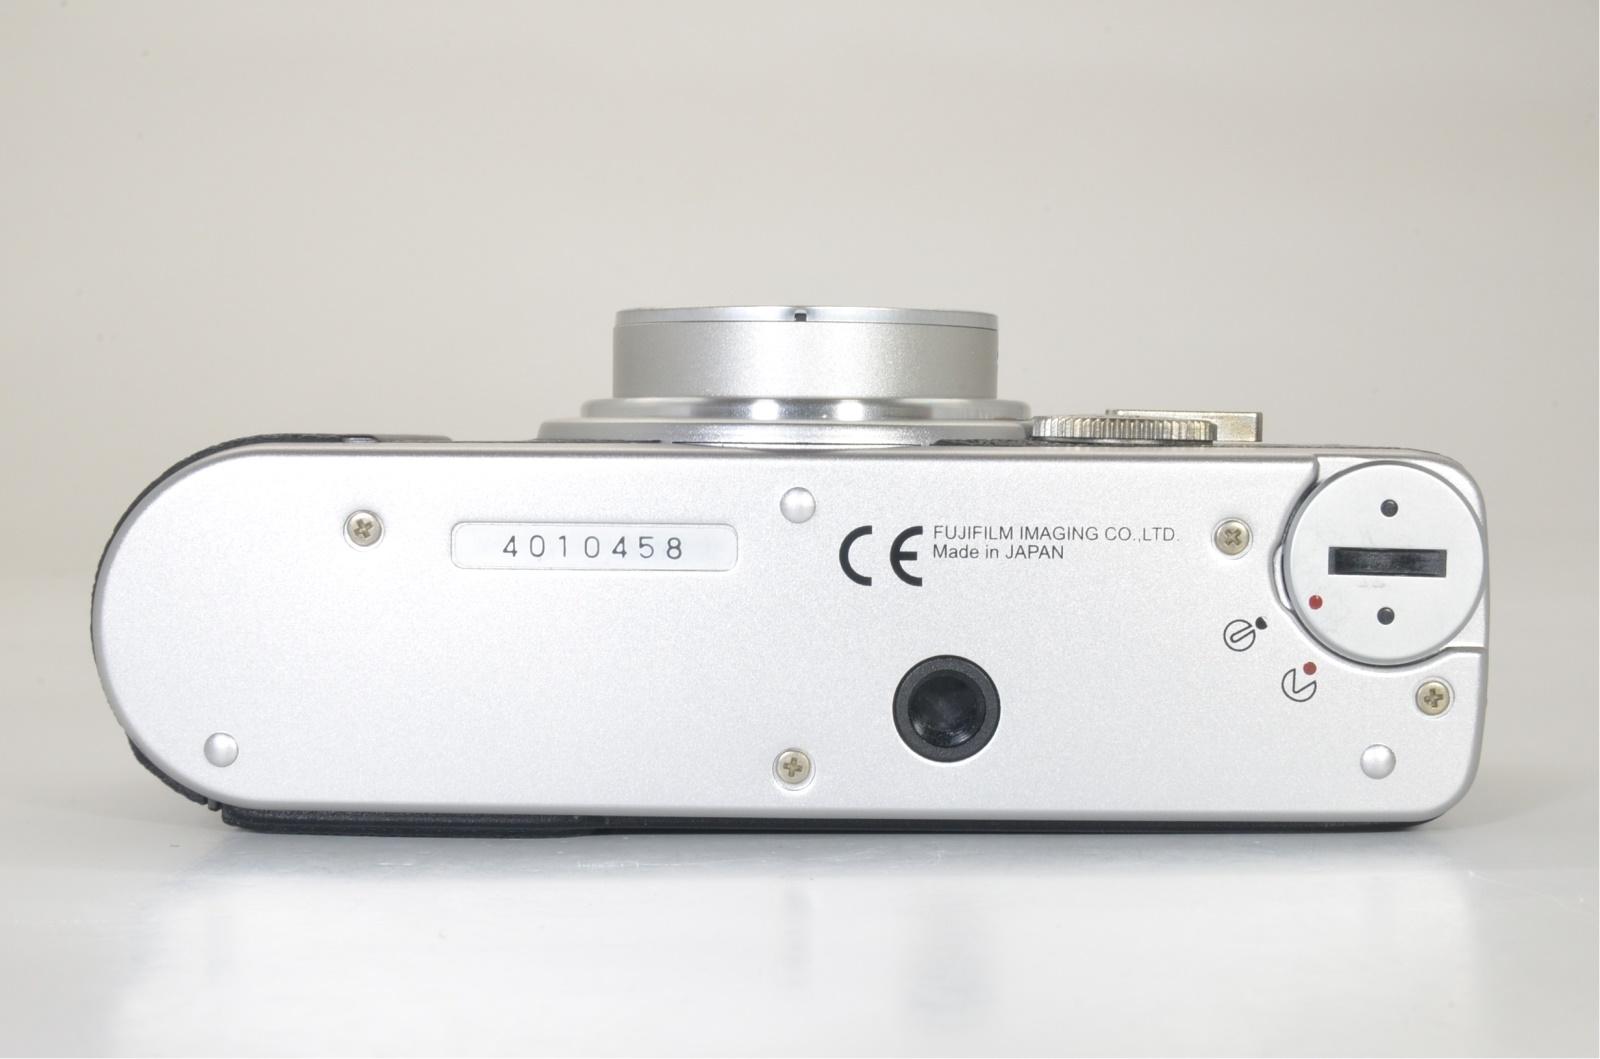 fuji fujifilm klasse w silver 28mm f2.8 film camera from japan shooting tested